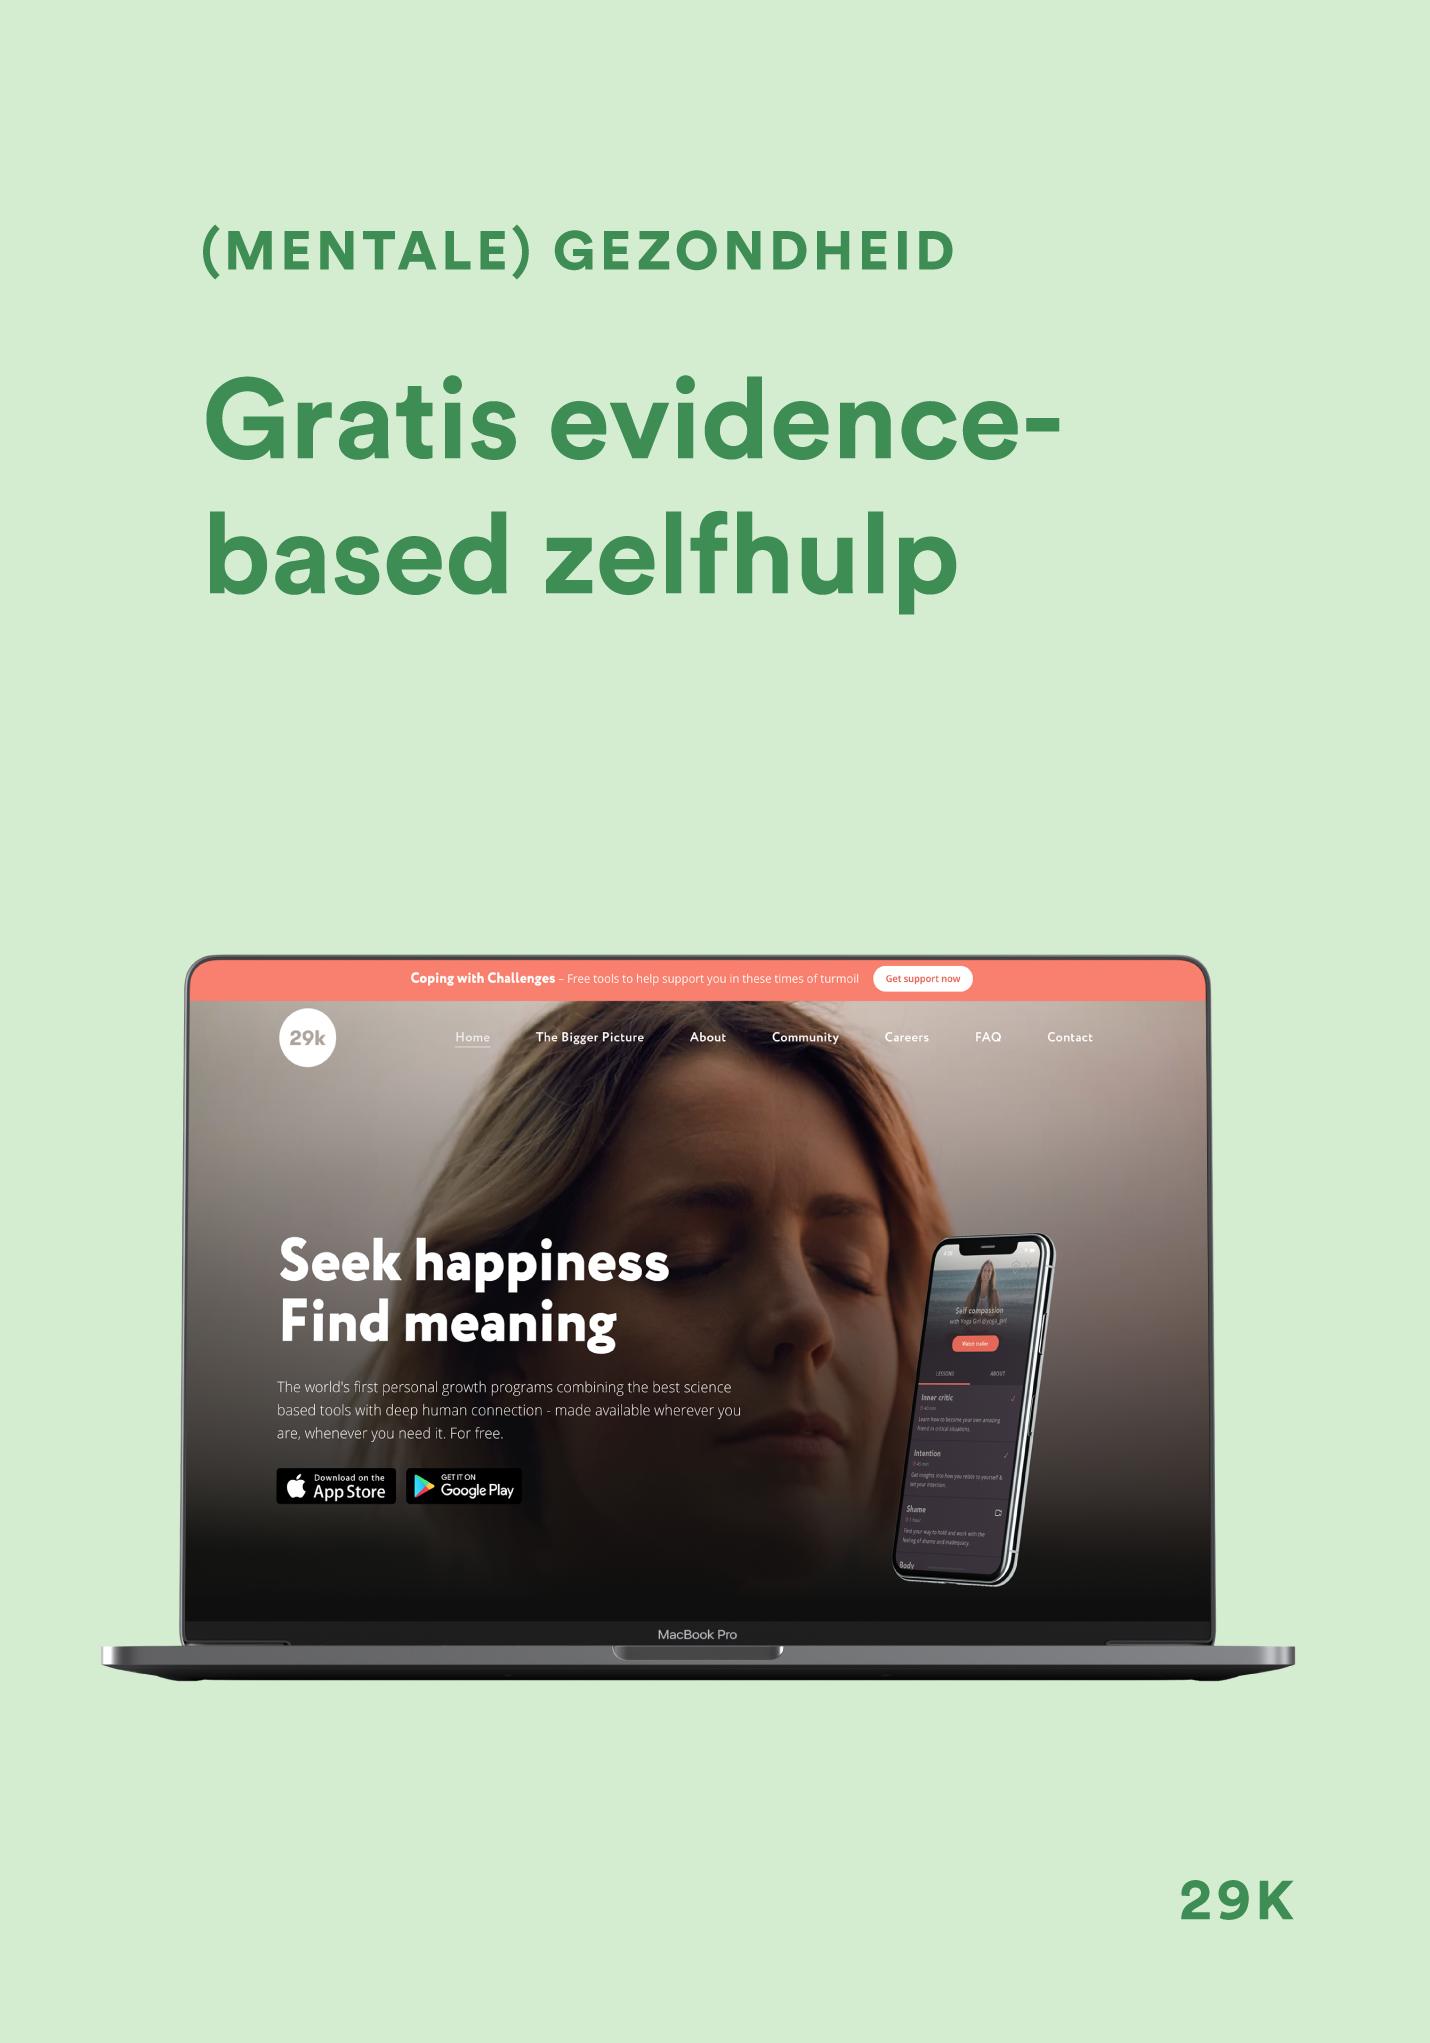 Project - 29K - Gratis evidence-based zelfhulp